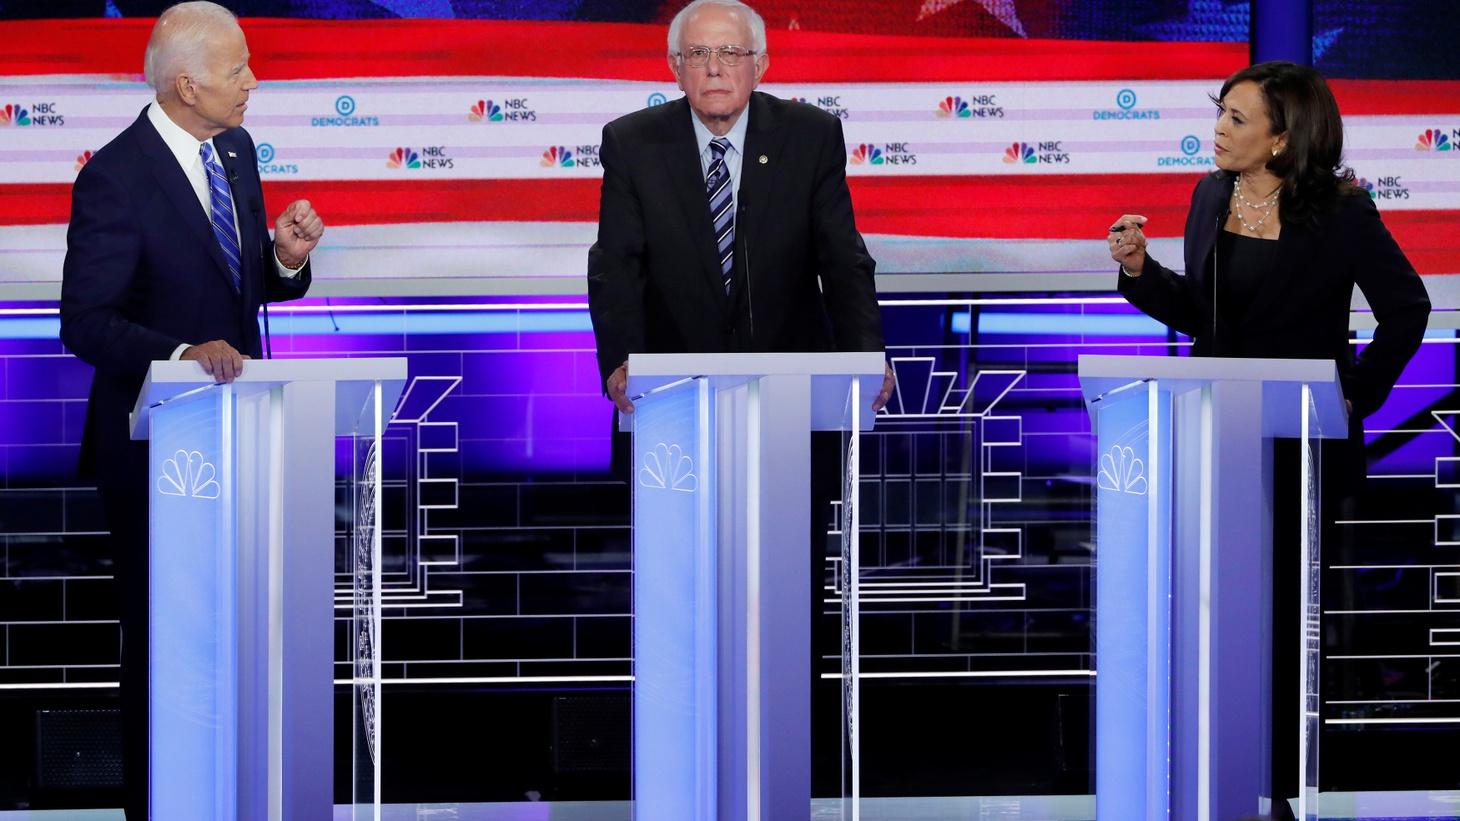 Former Vice President Joe Biden and Senator Kamala Harris debate racial issues as Senator Bernie Sanders listens during the second night of the first U.S. Democratic presidential candidates 2020 election debate in Miami, Florida, U.S., June 27, 2019.